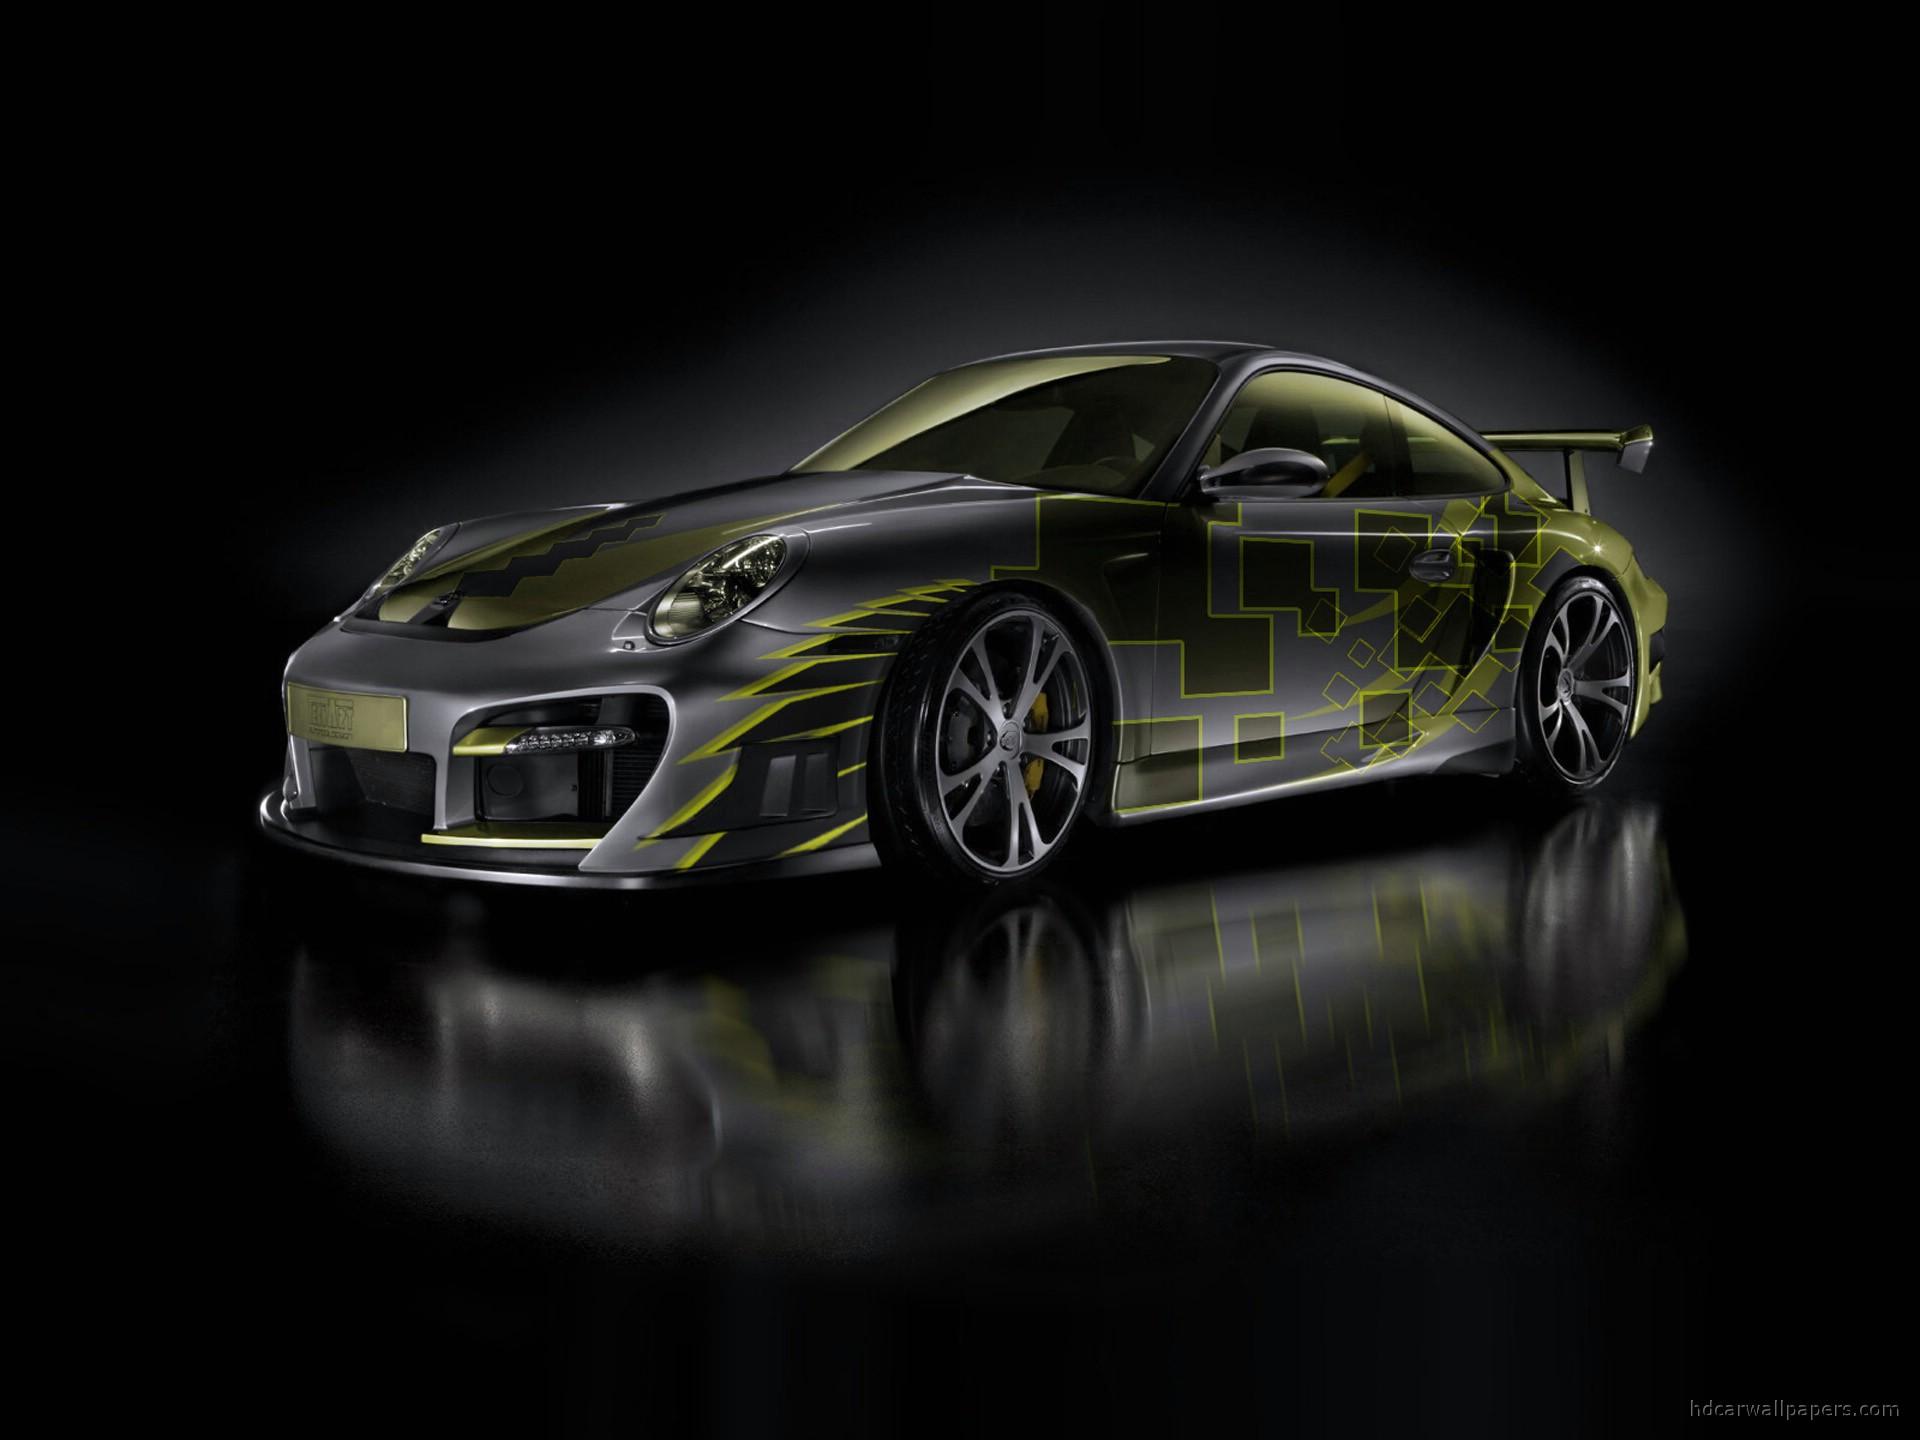 Automotive Josh Porsche 911 Turbo Wallpaper 1920x1440